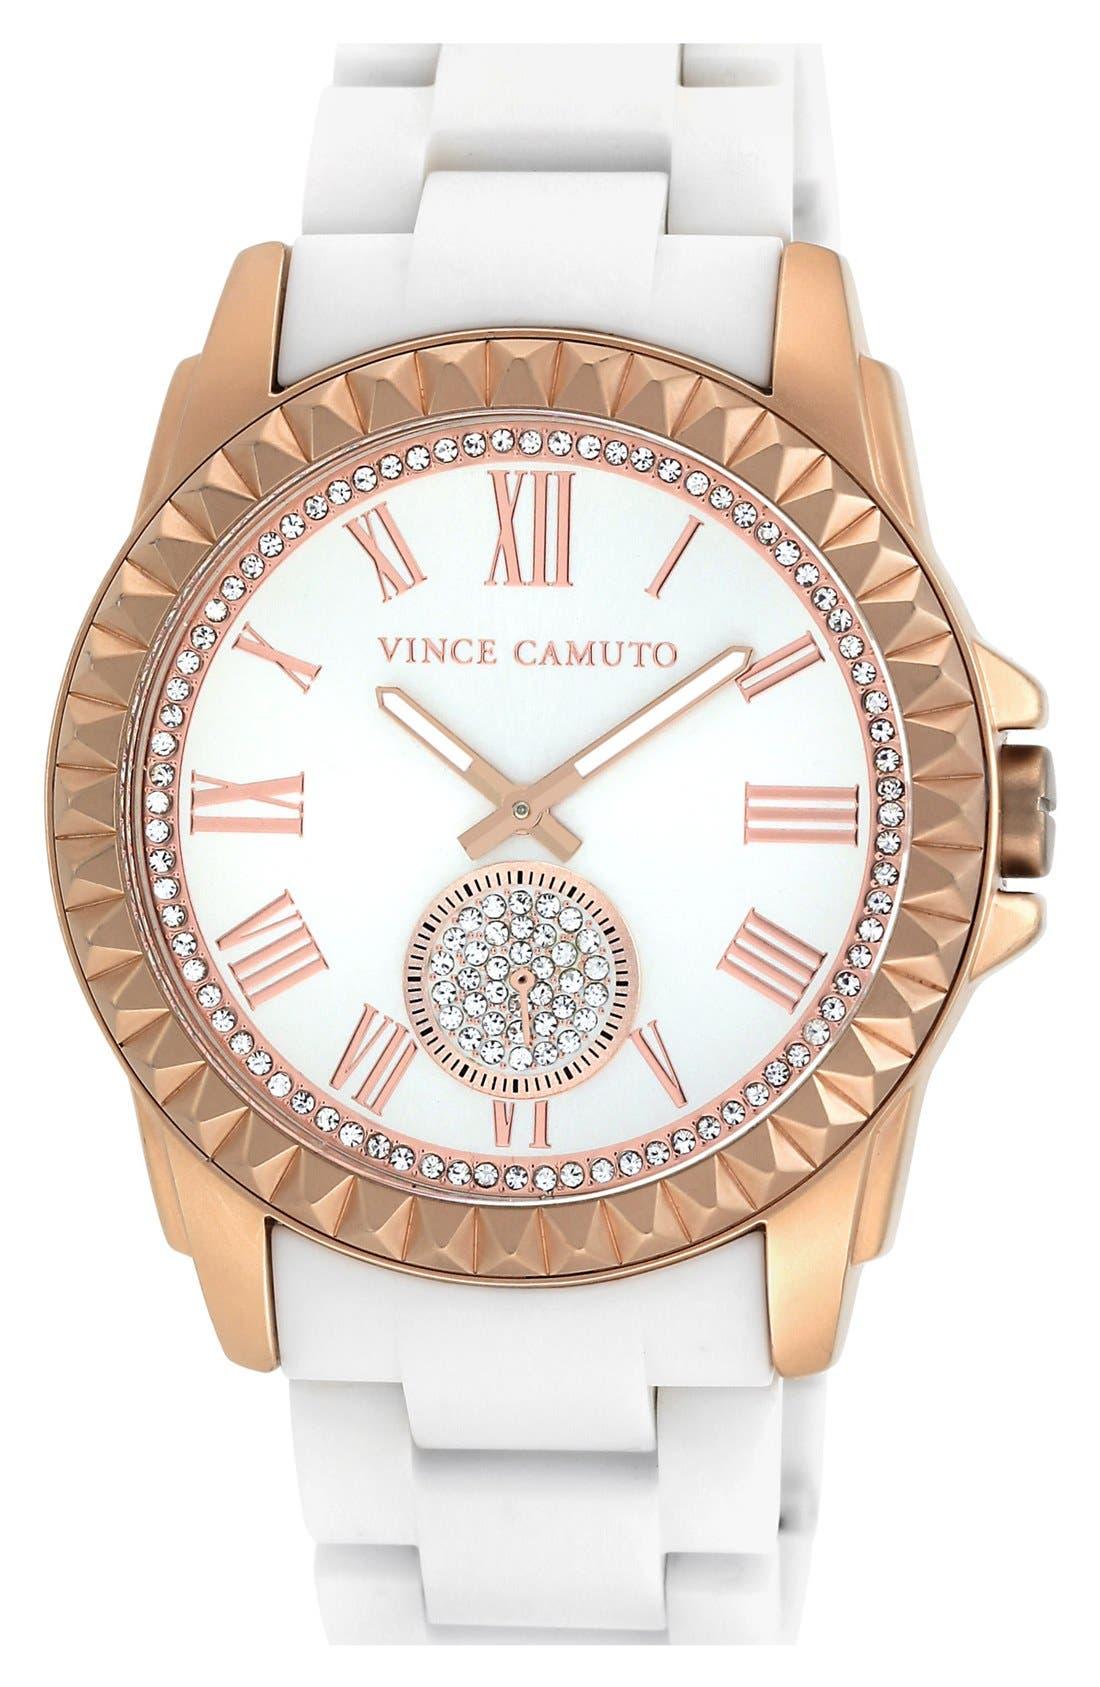 Main Image - Vince Camuto Pyramid Bezel Ceramic Bracelet Watch, 44mm x 49mm